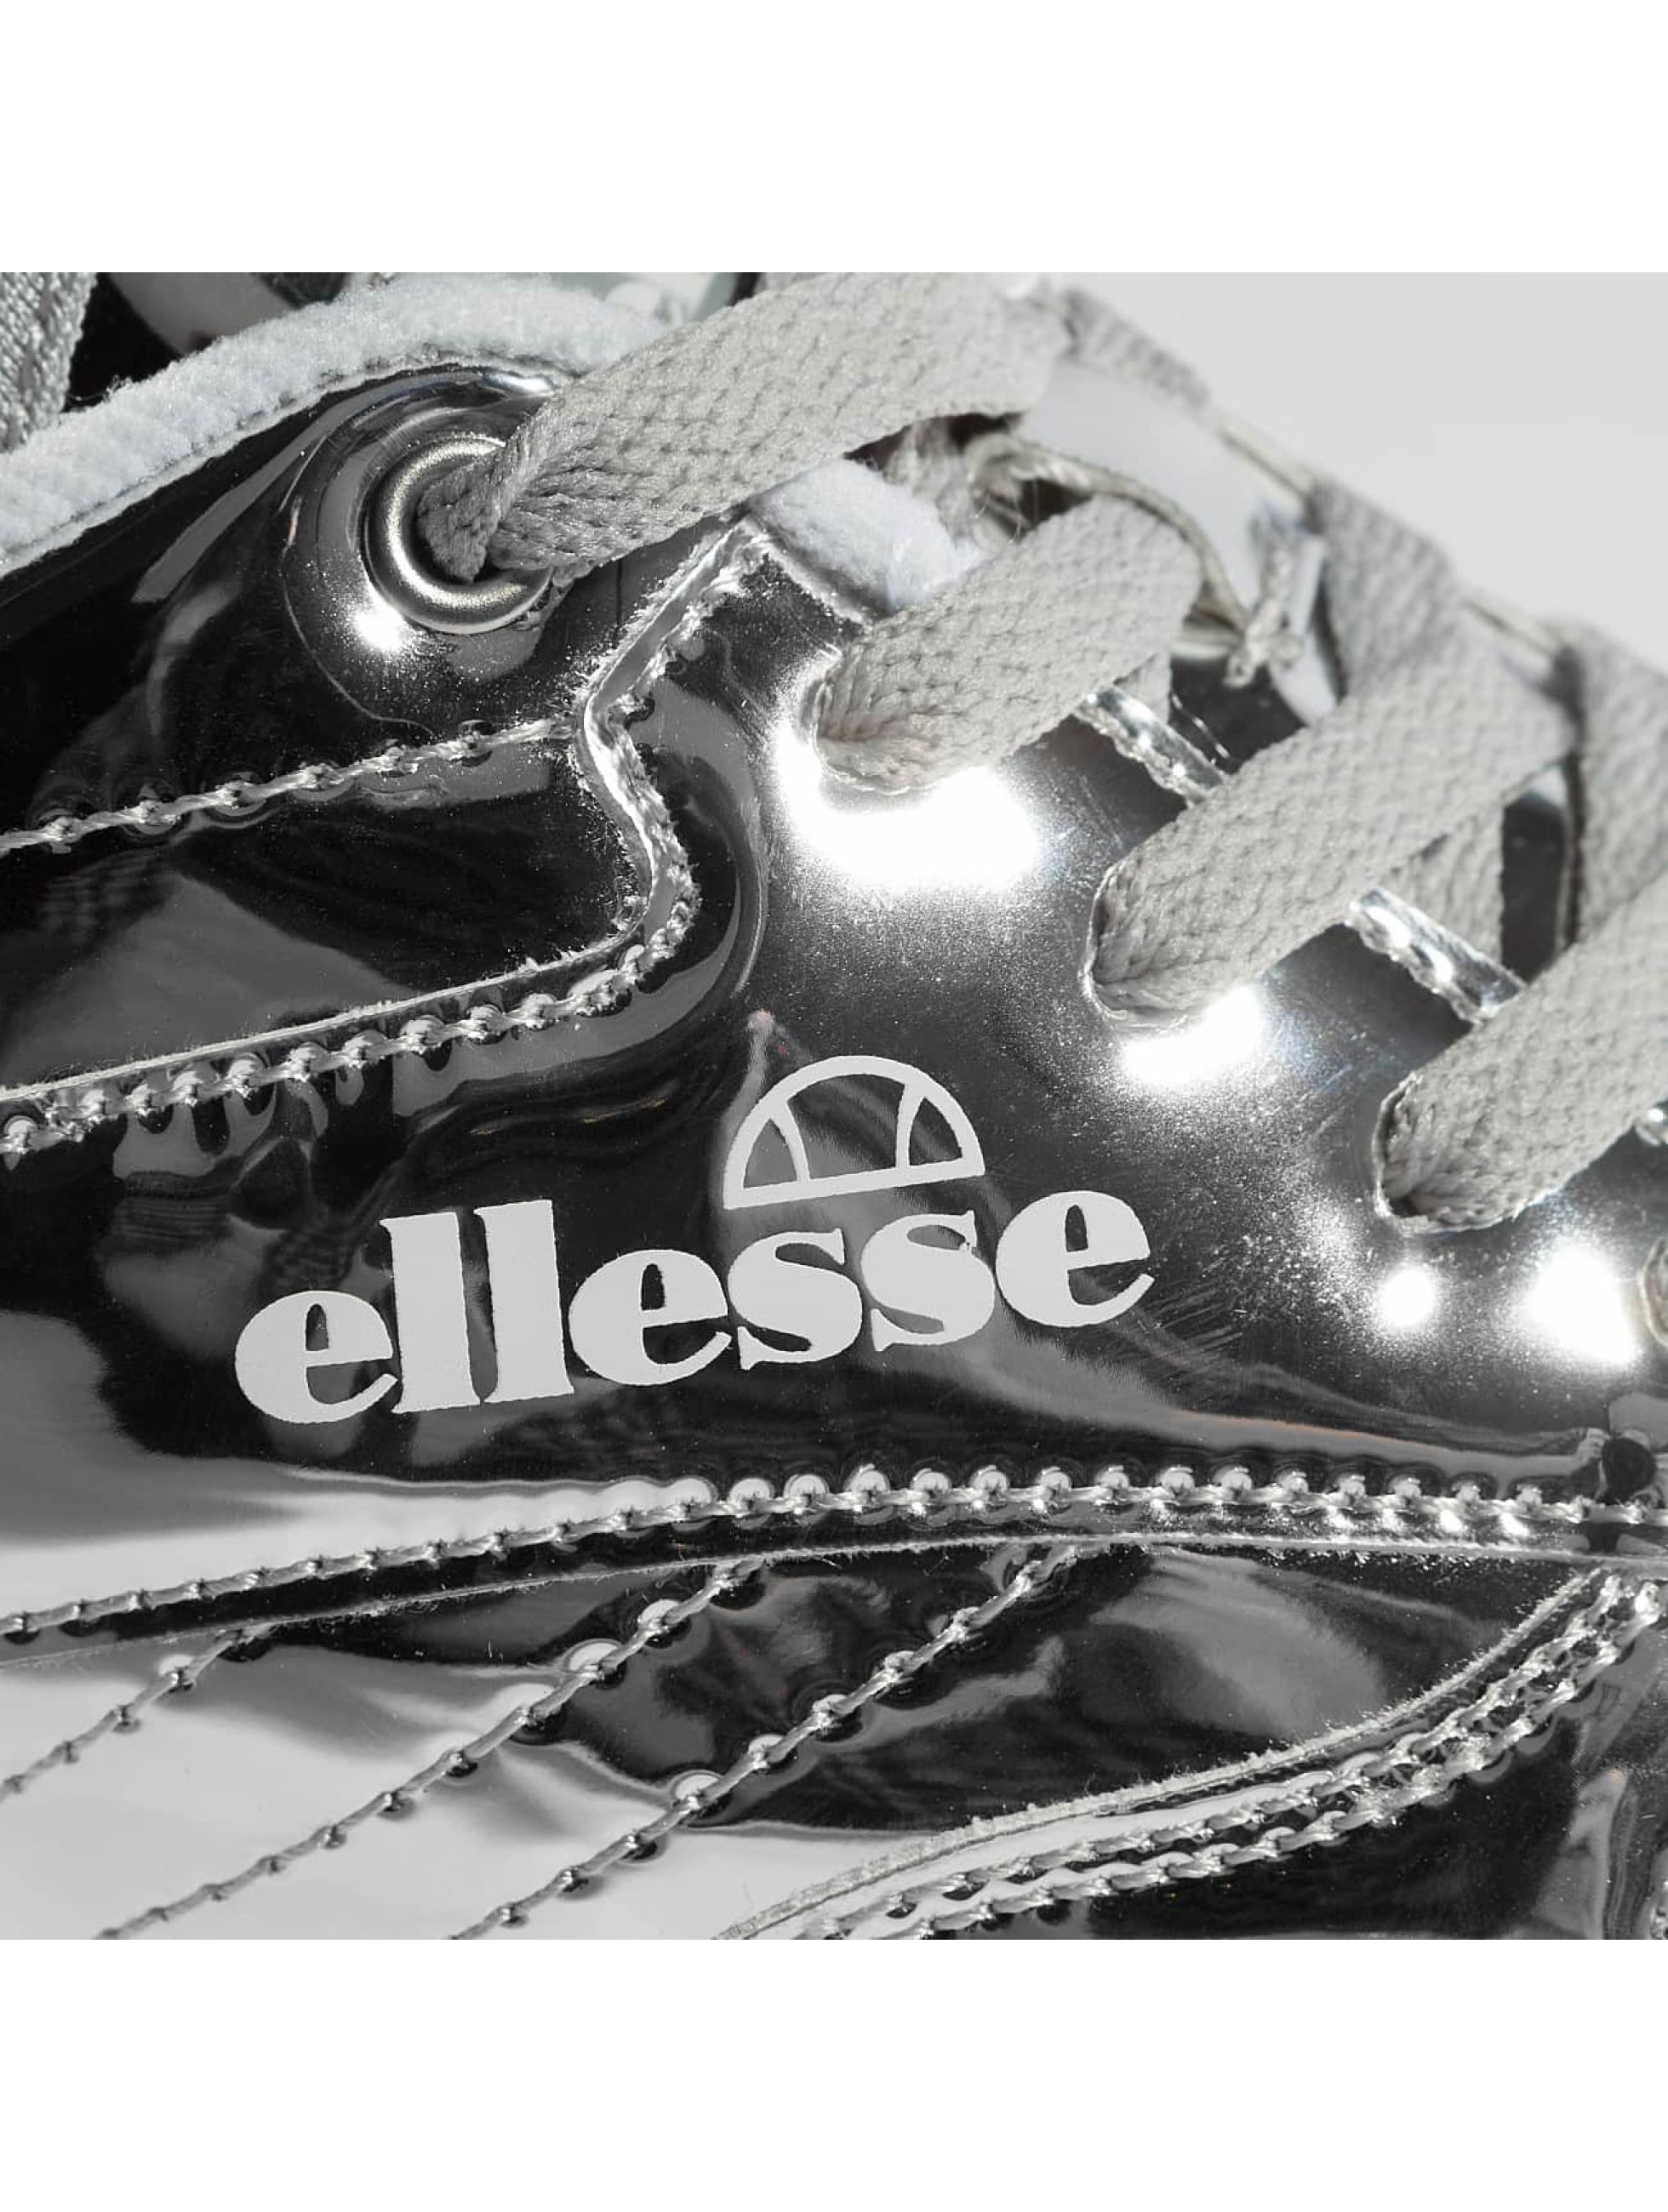 Ellesse Baskets Heritage City Runner Metallic Runner argent